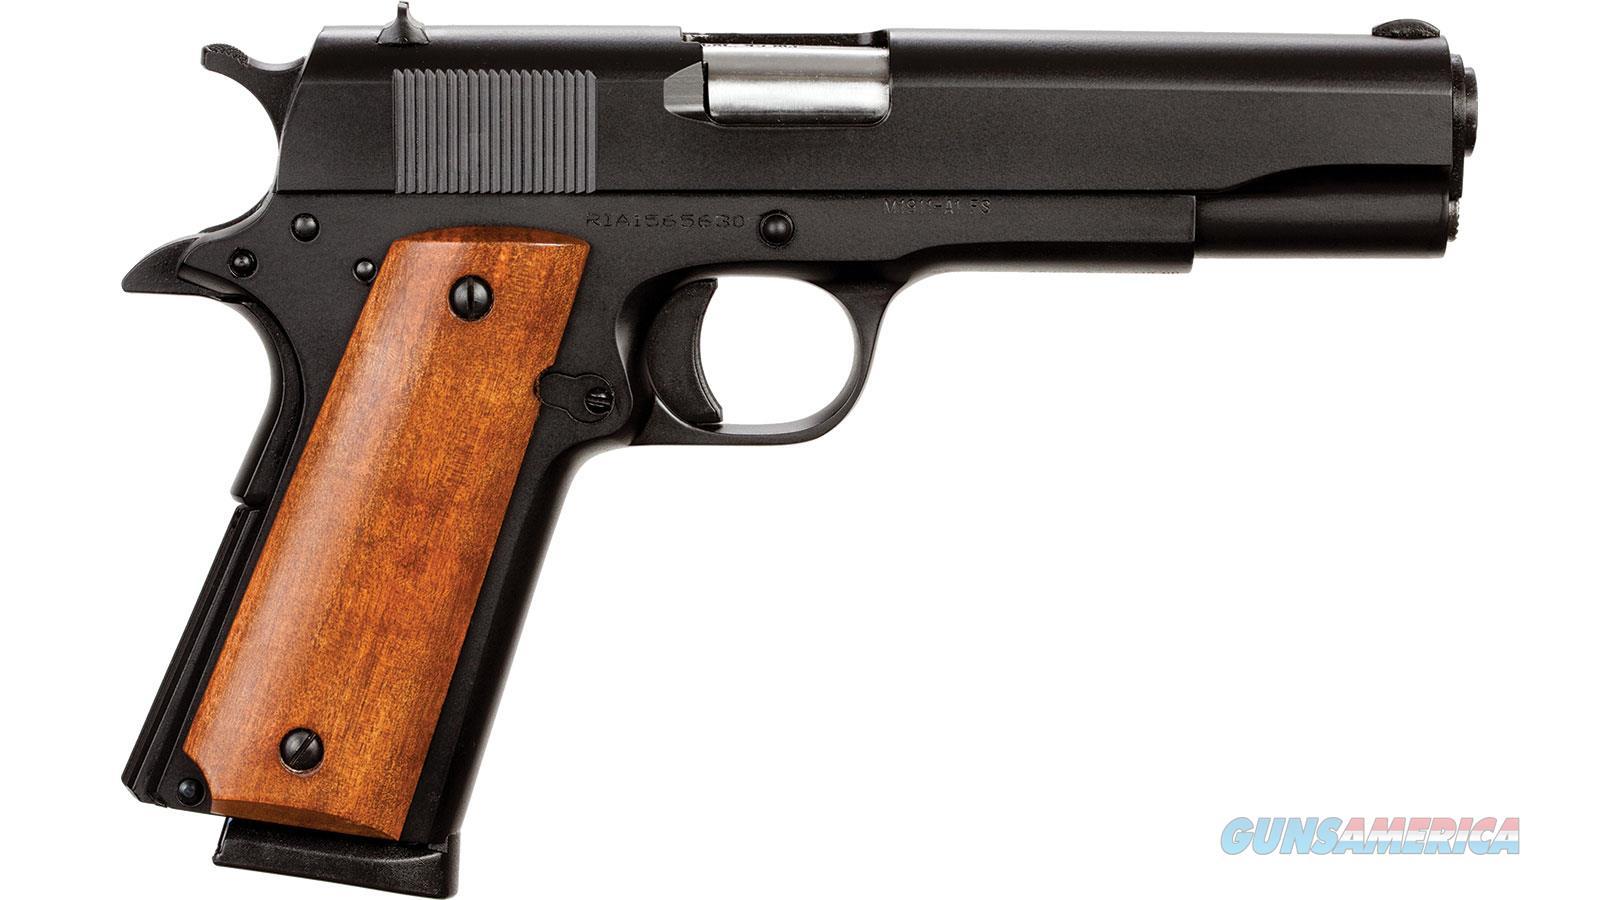 Gi Standard Fs Duracoat .45Acp 51420  Guns > Pistols > A Misc Pistols